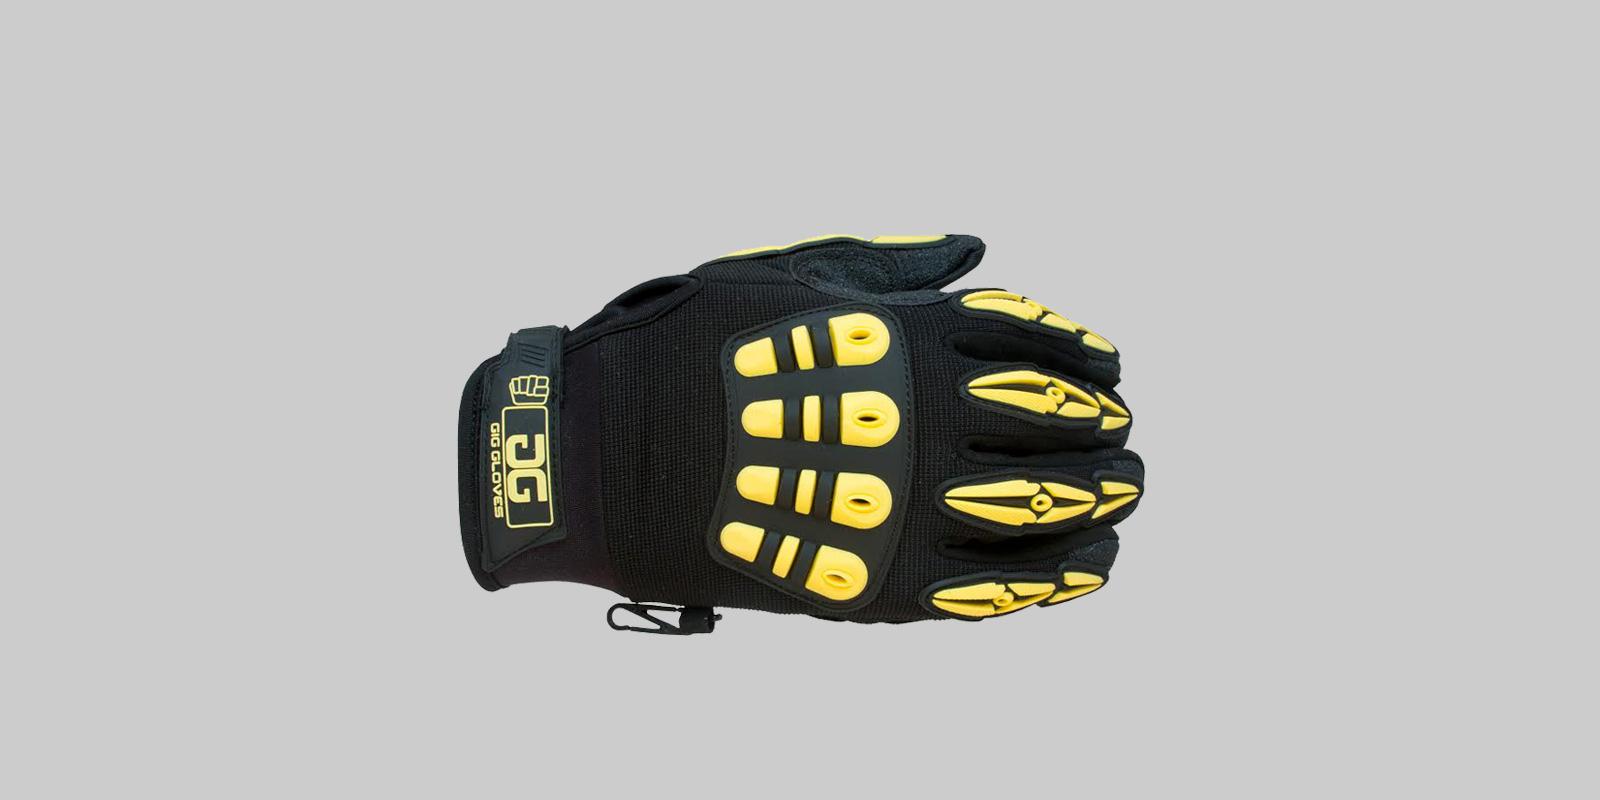 Gig Gear gloves